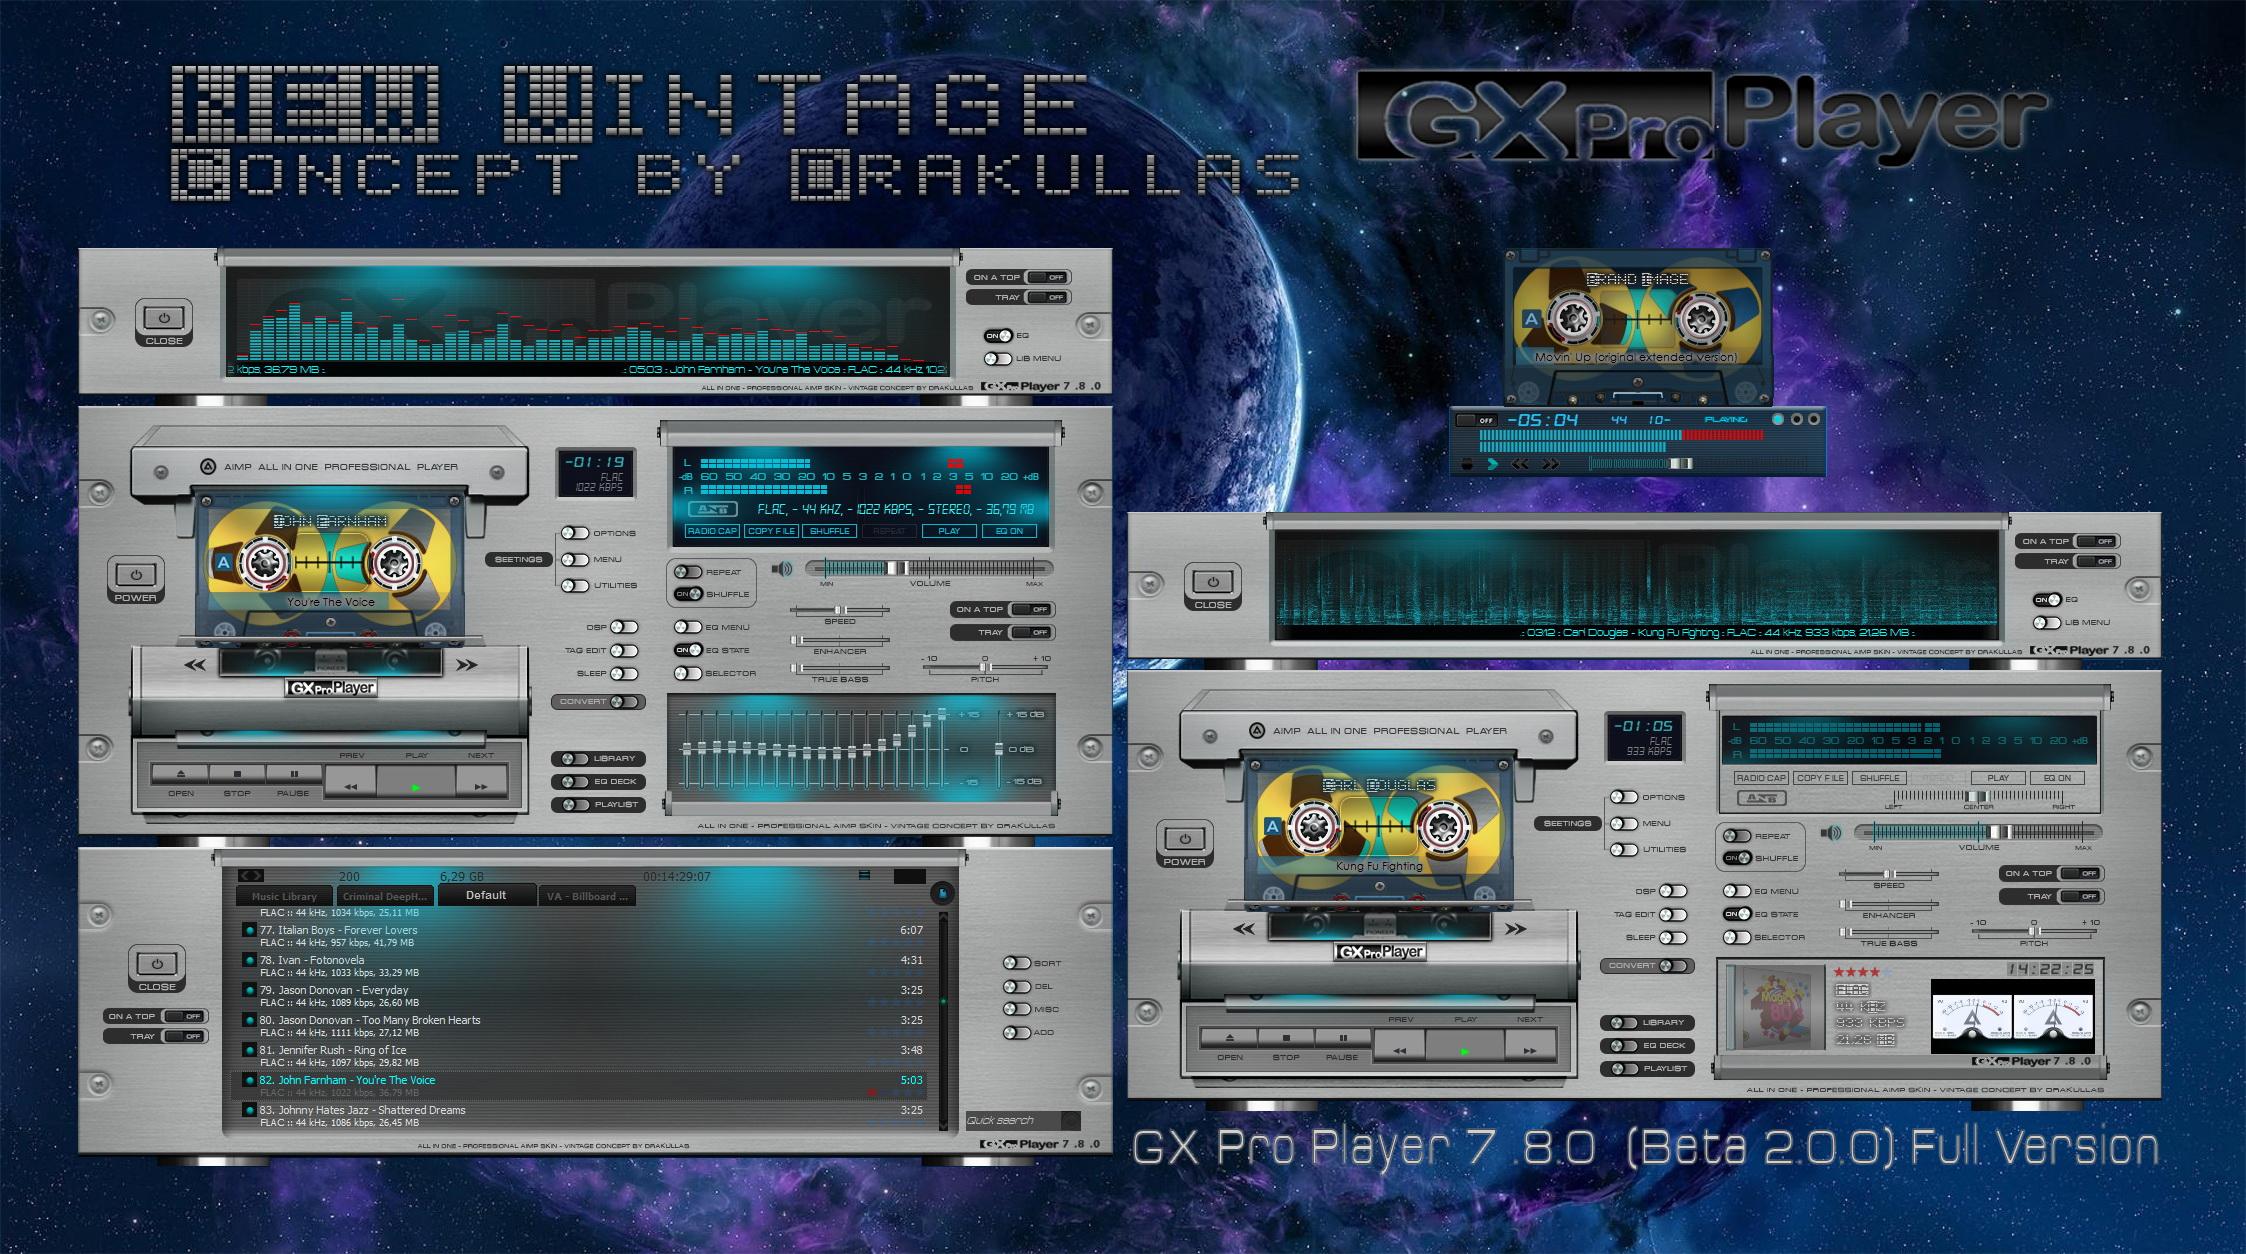 GX Pro Player 7 8 0 Beta 2 2 0 Full Version by drakullas on DeviantArt